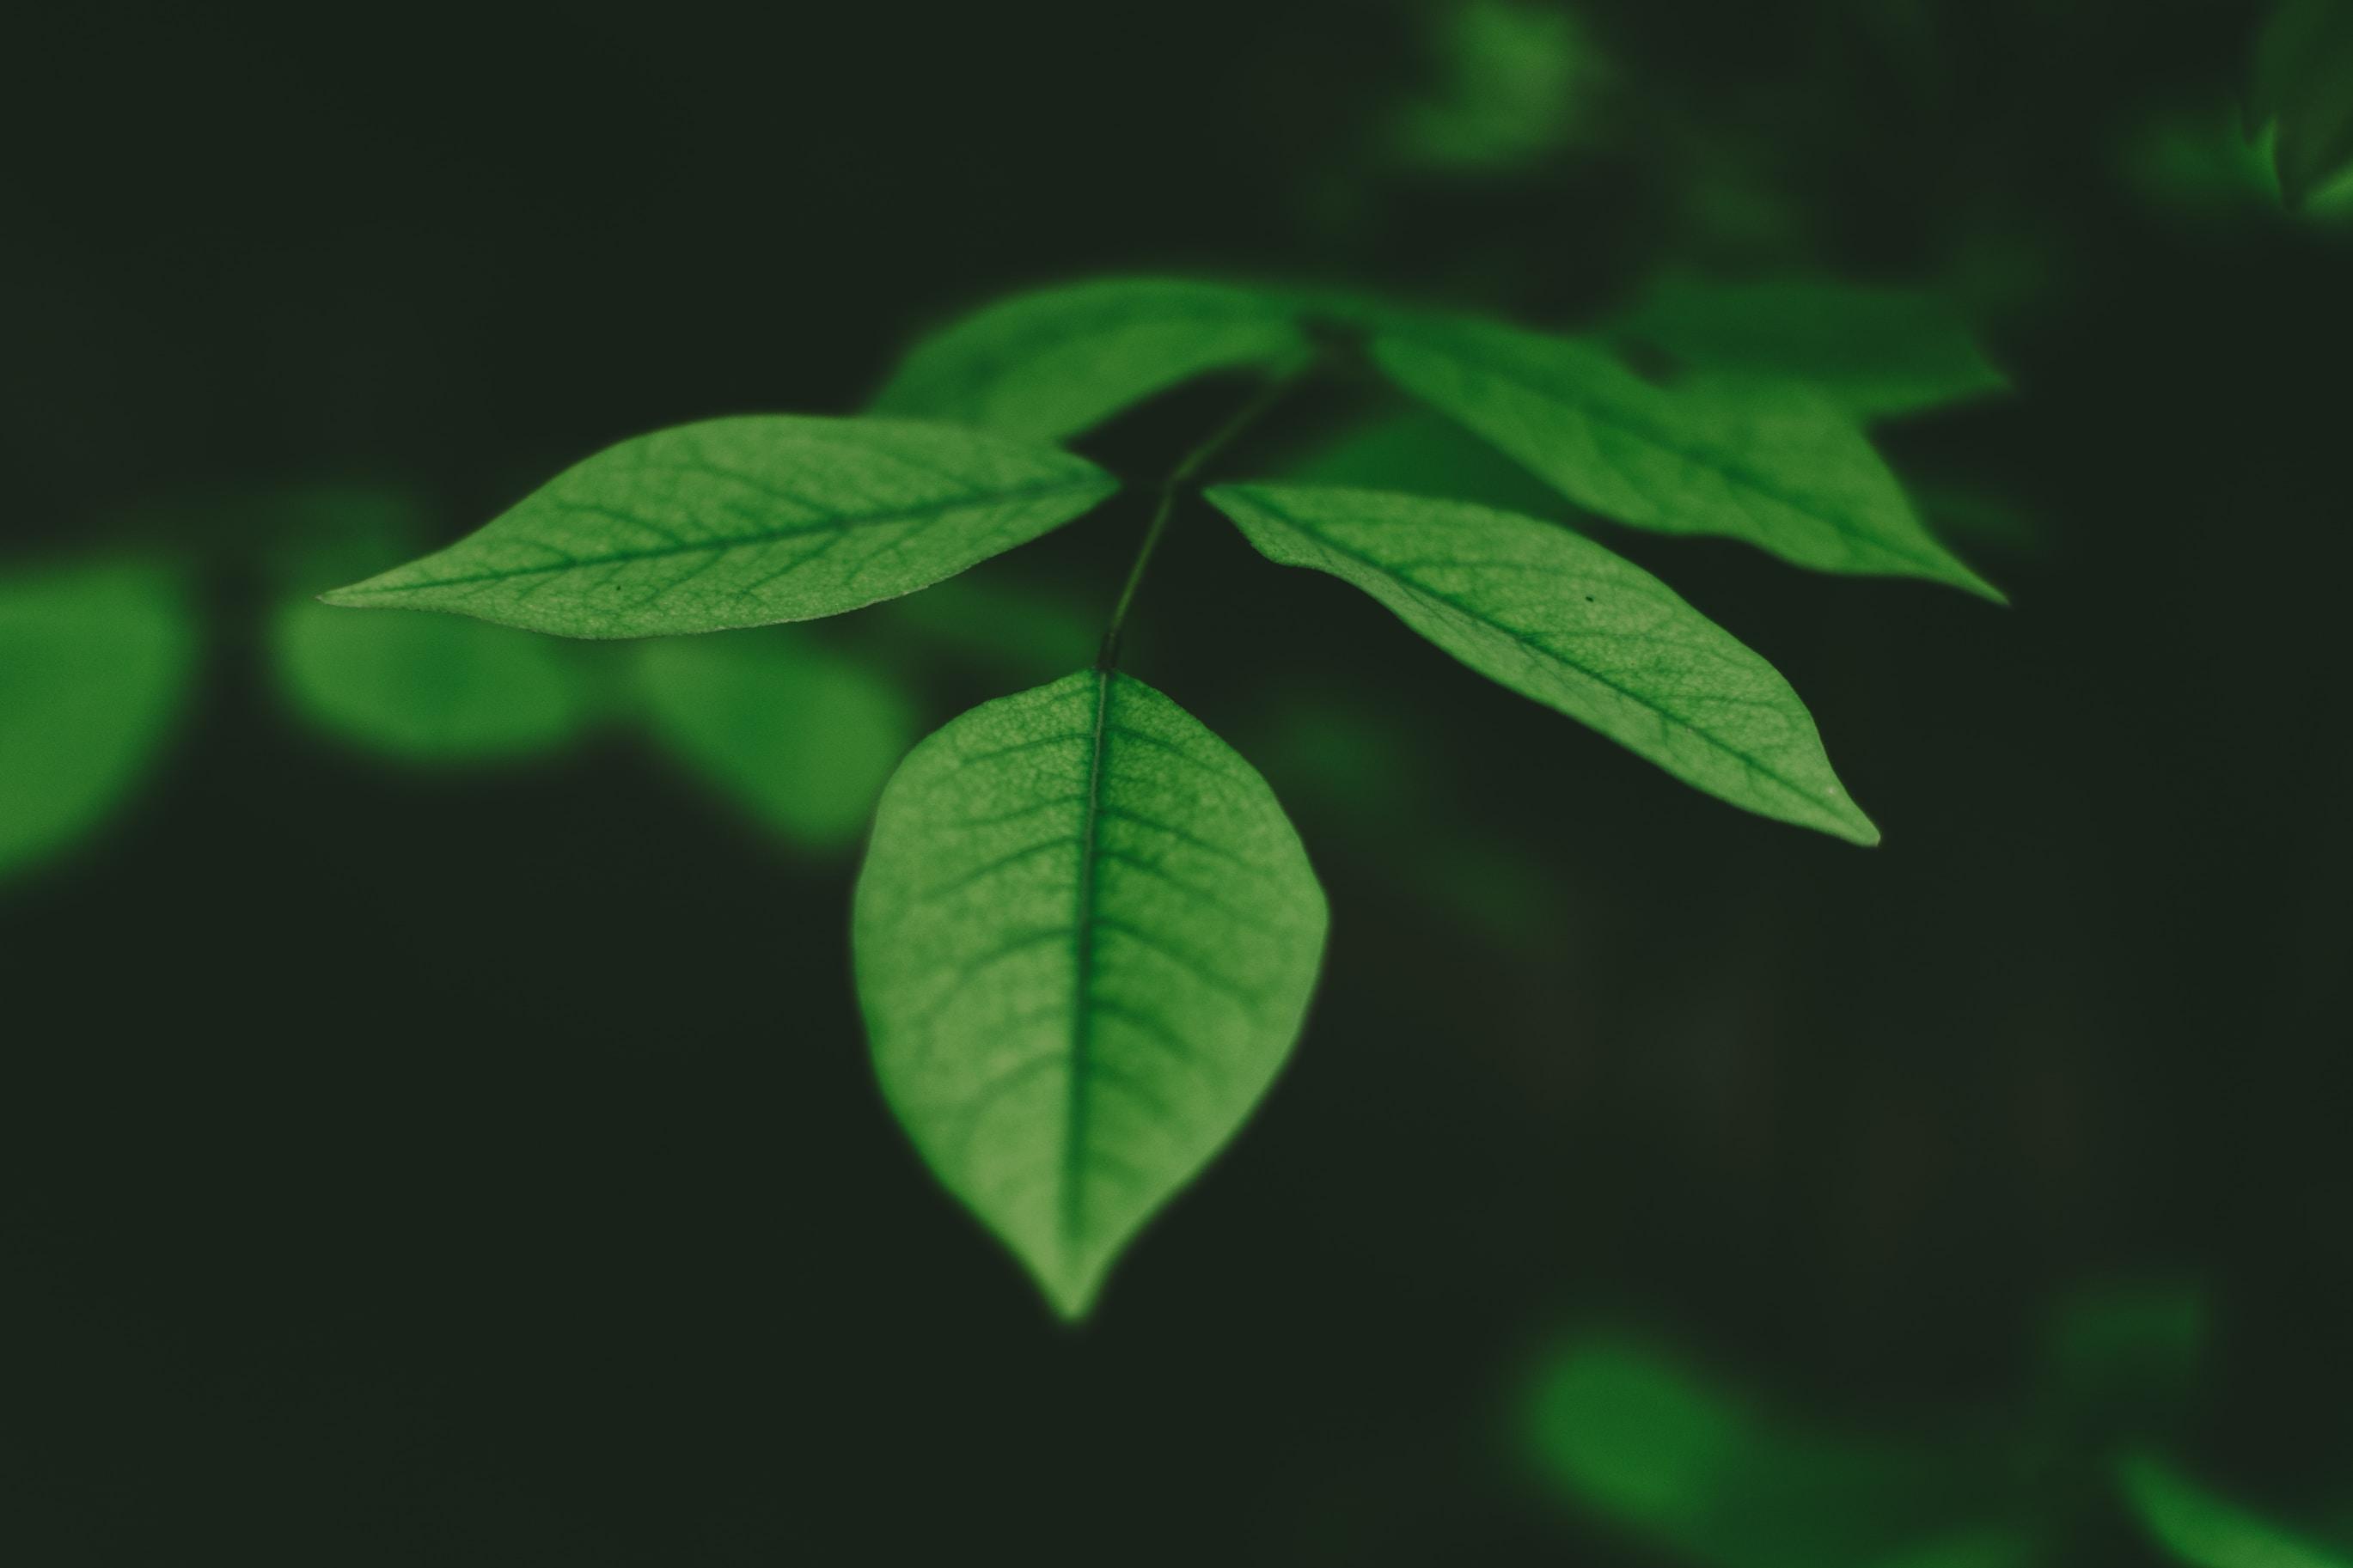 Poem: Evergreen encouragement stories